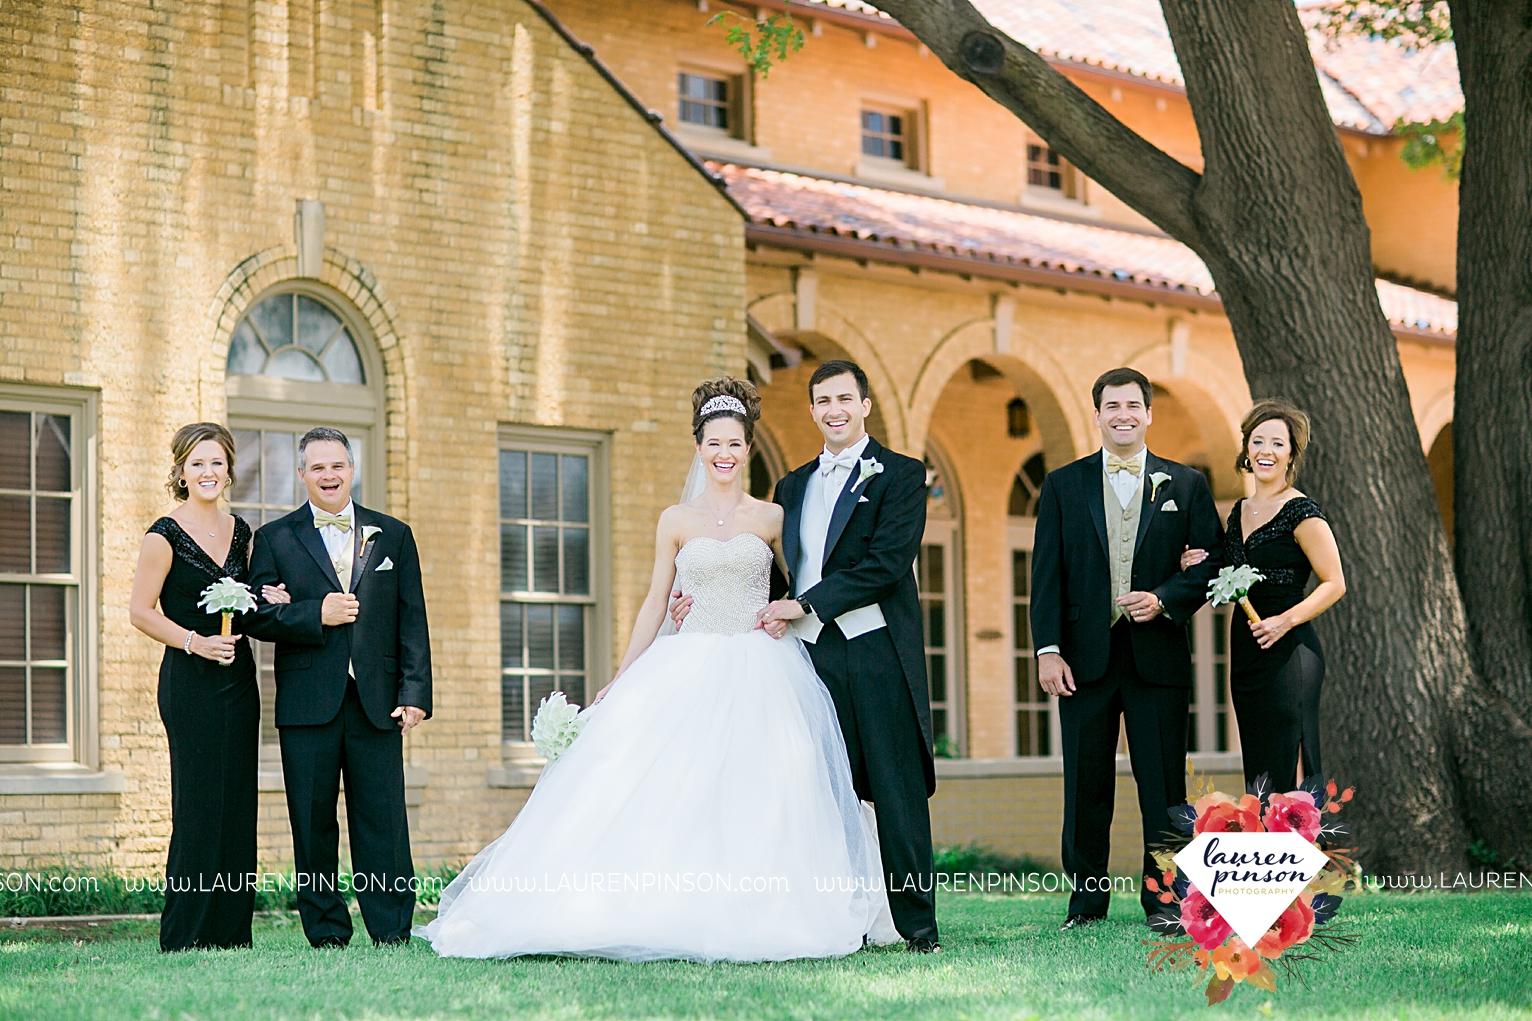 wichita-falls-texas-wedding-photographer-the-forum-by-the-kemp-mayfield-events-ulta-gold-glitter_2847.jpg